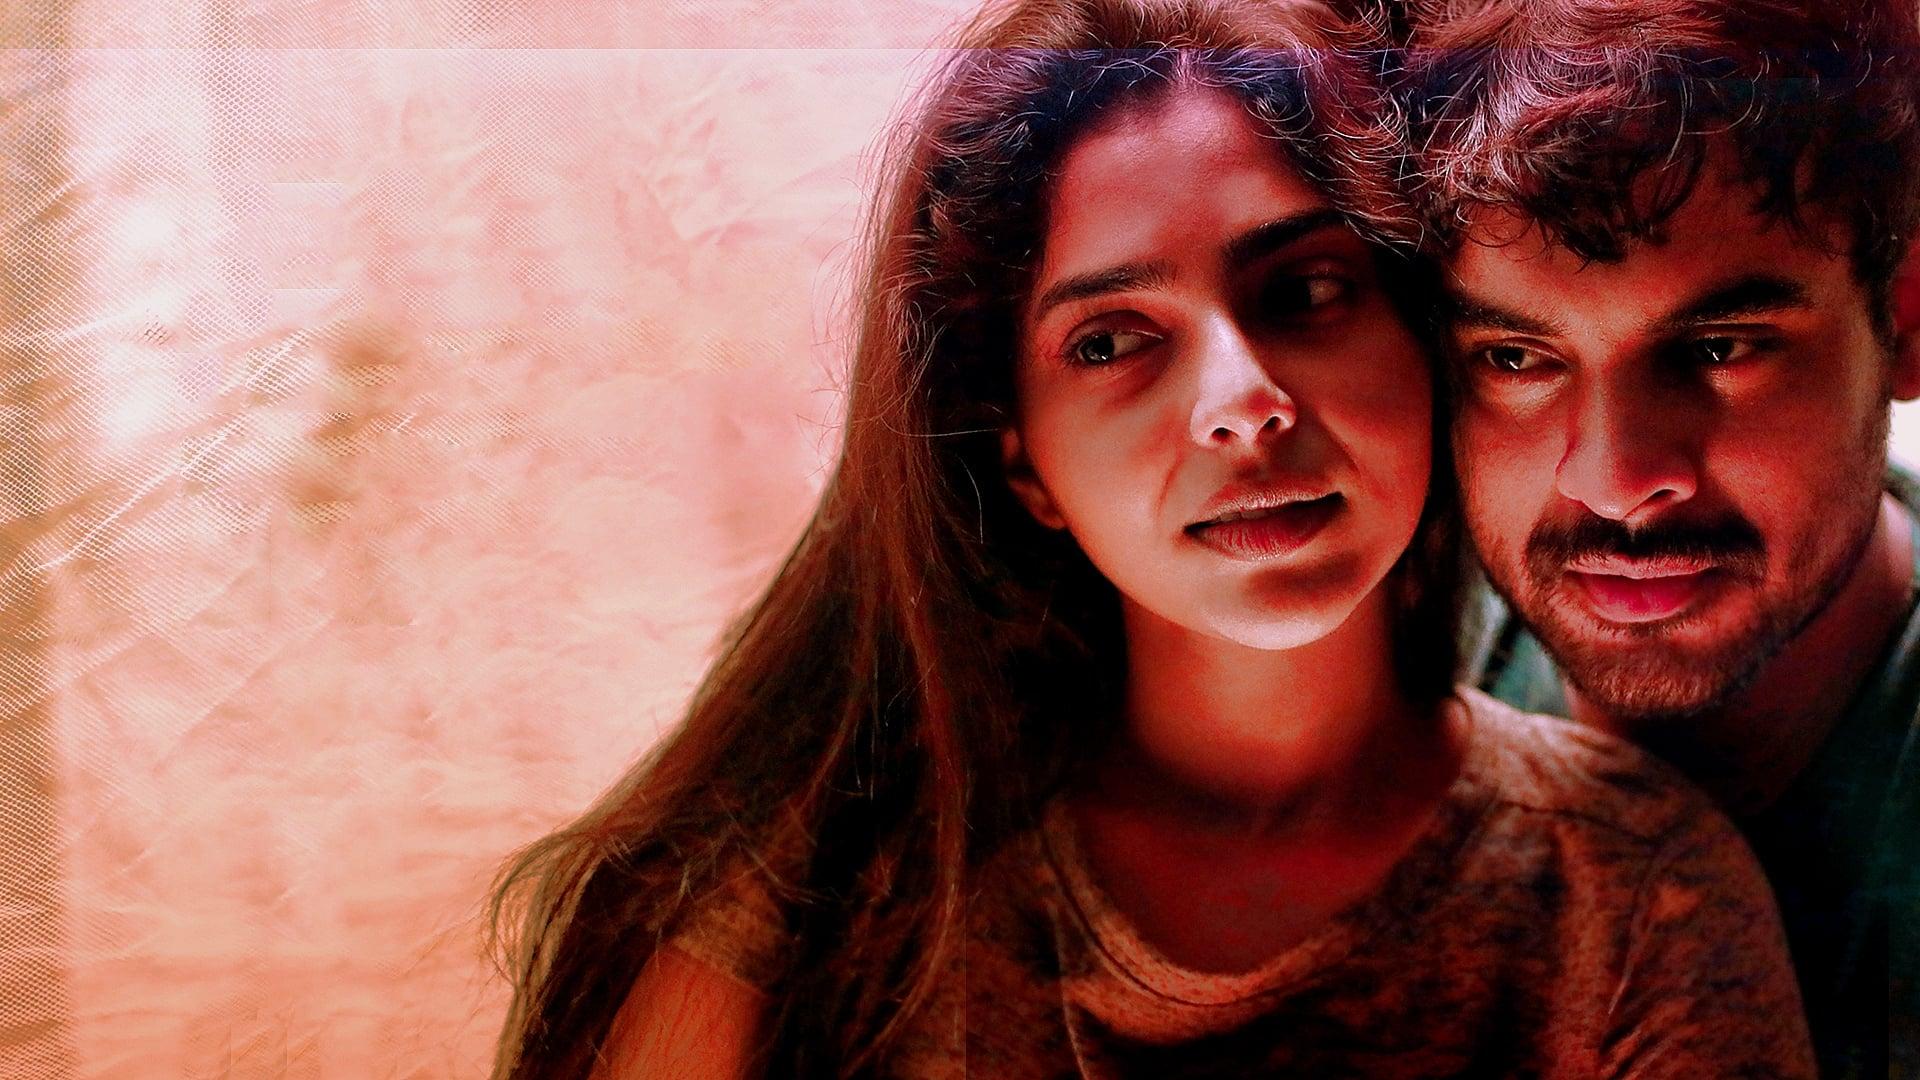 Neha nair playback singer